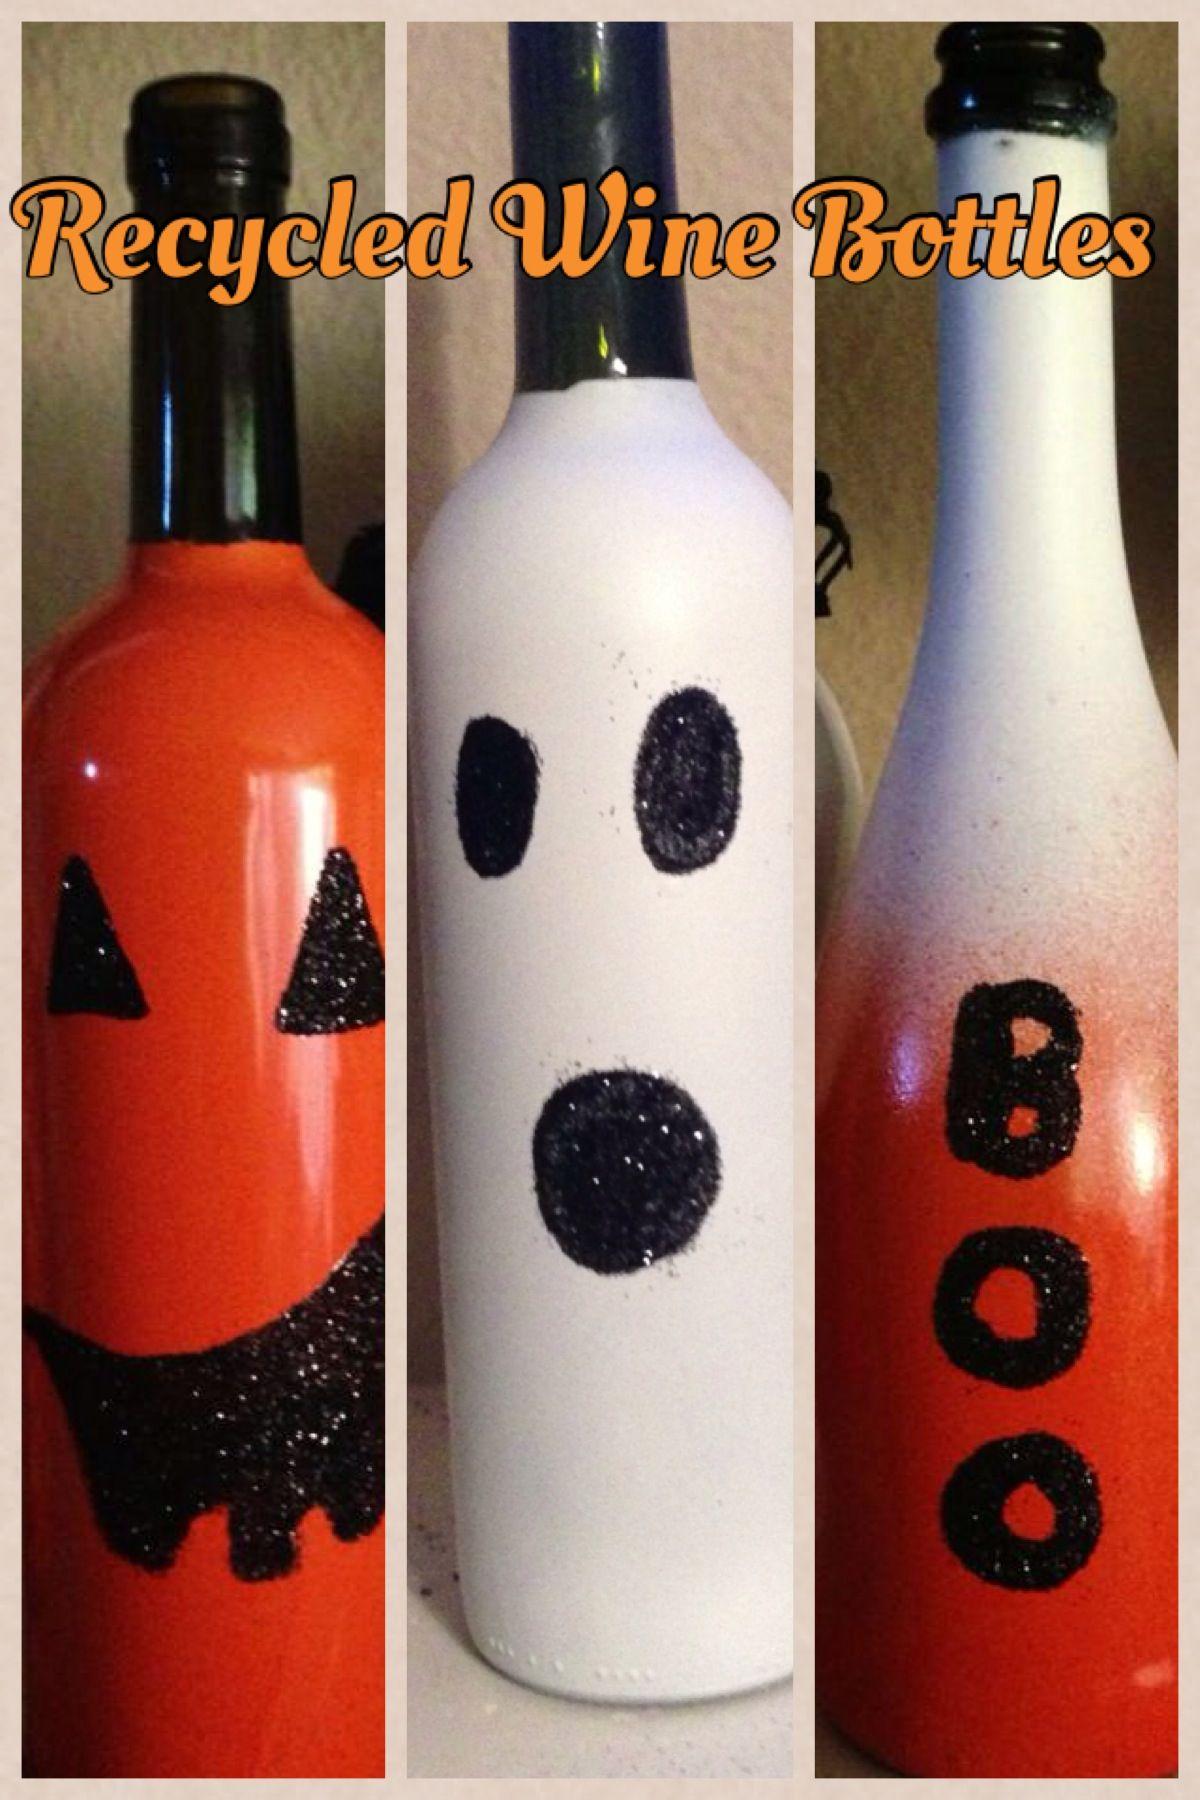 Recycled Wine Bottles For Halloween Halloween Pumpkin Ghost Boo Wine Bottle Diy Crafts Recycled Wine Bottles Bottle Crafts